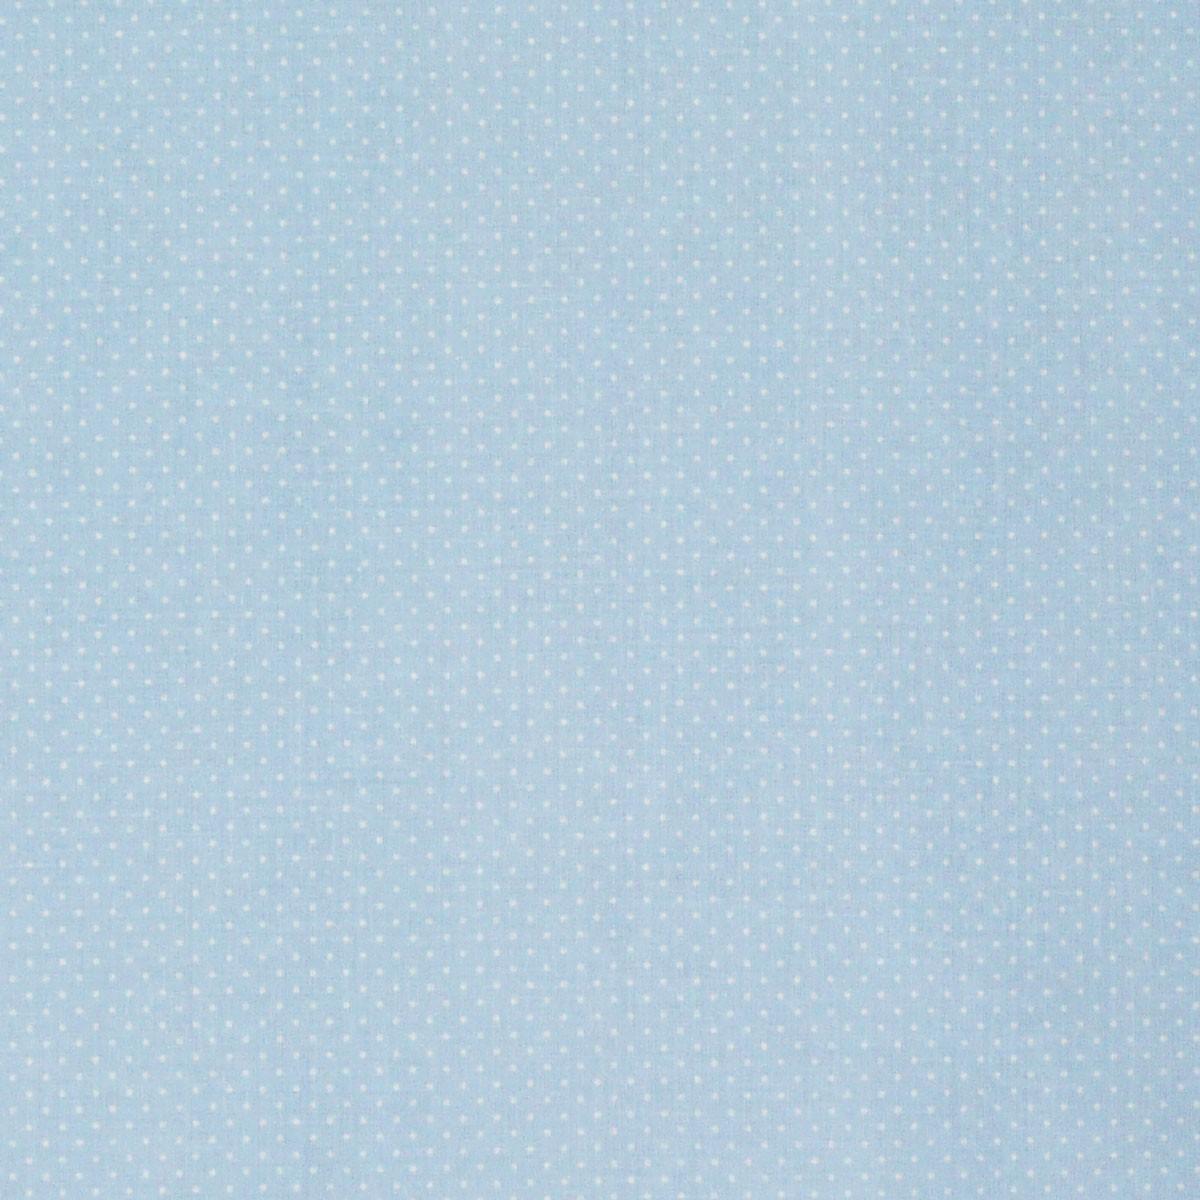 Baumwollstoff Punkte mini Ø 1mm babyblau weiß